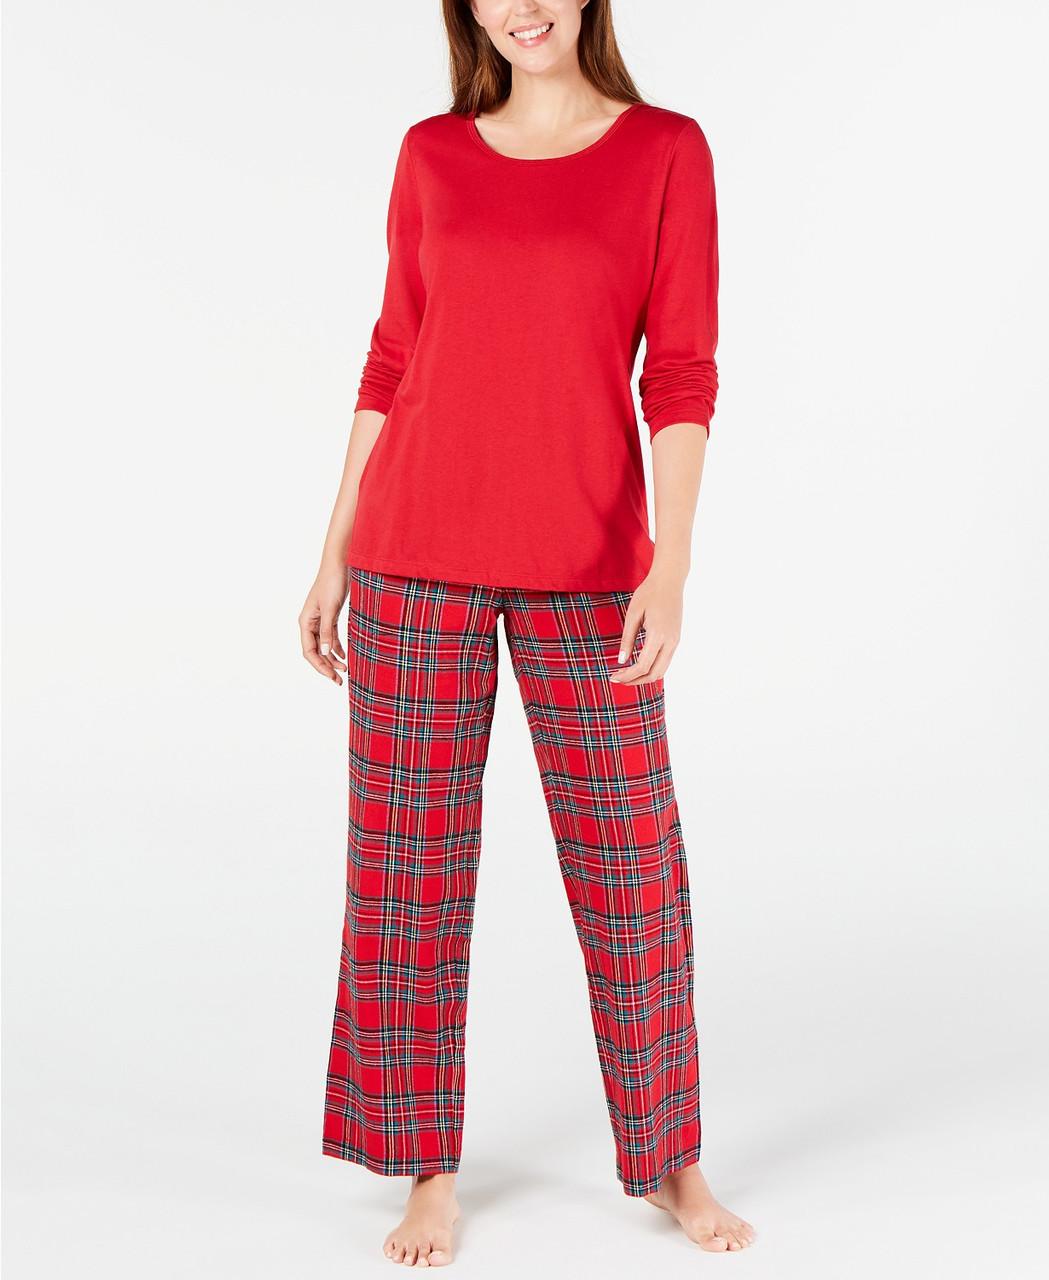 Family Pajamas женская пижама 2000000373232